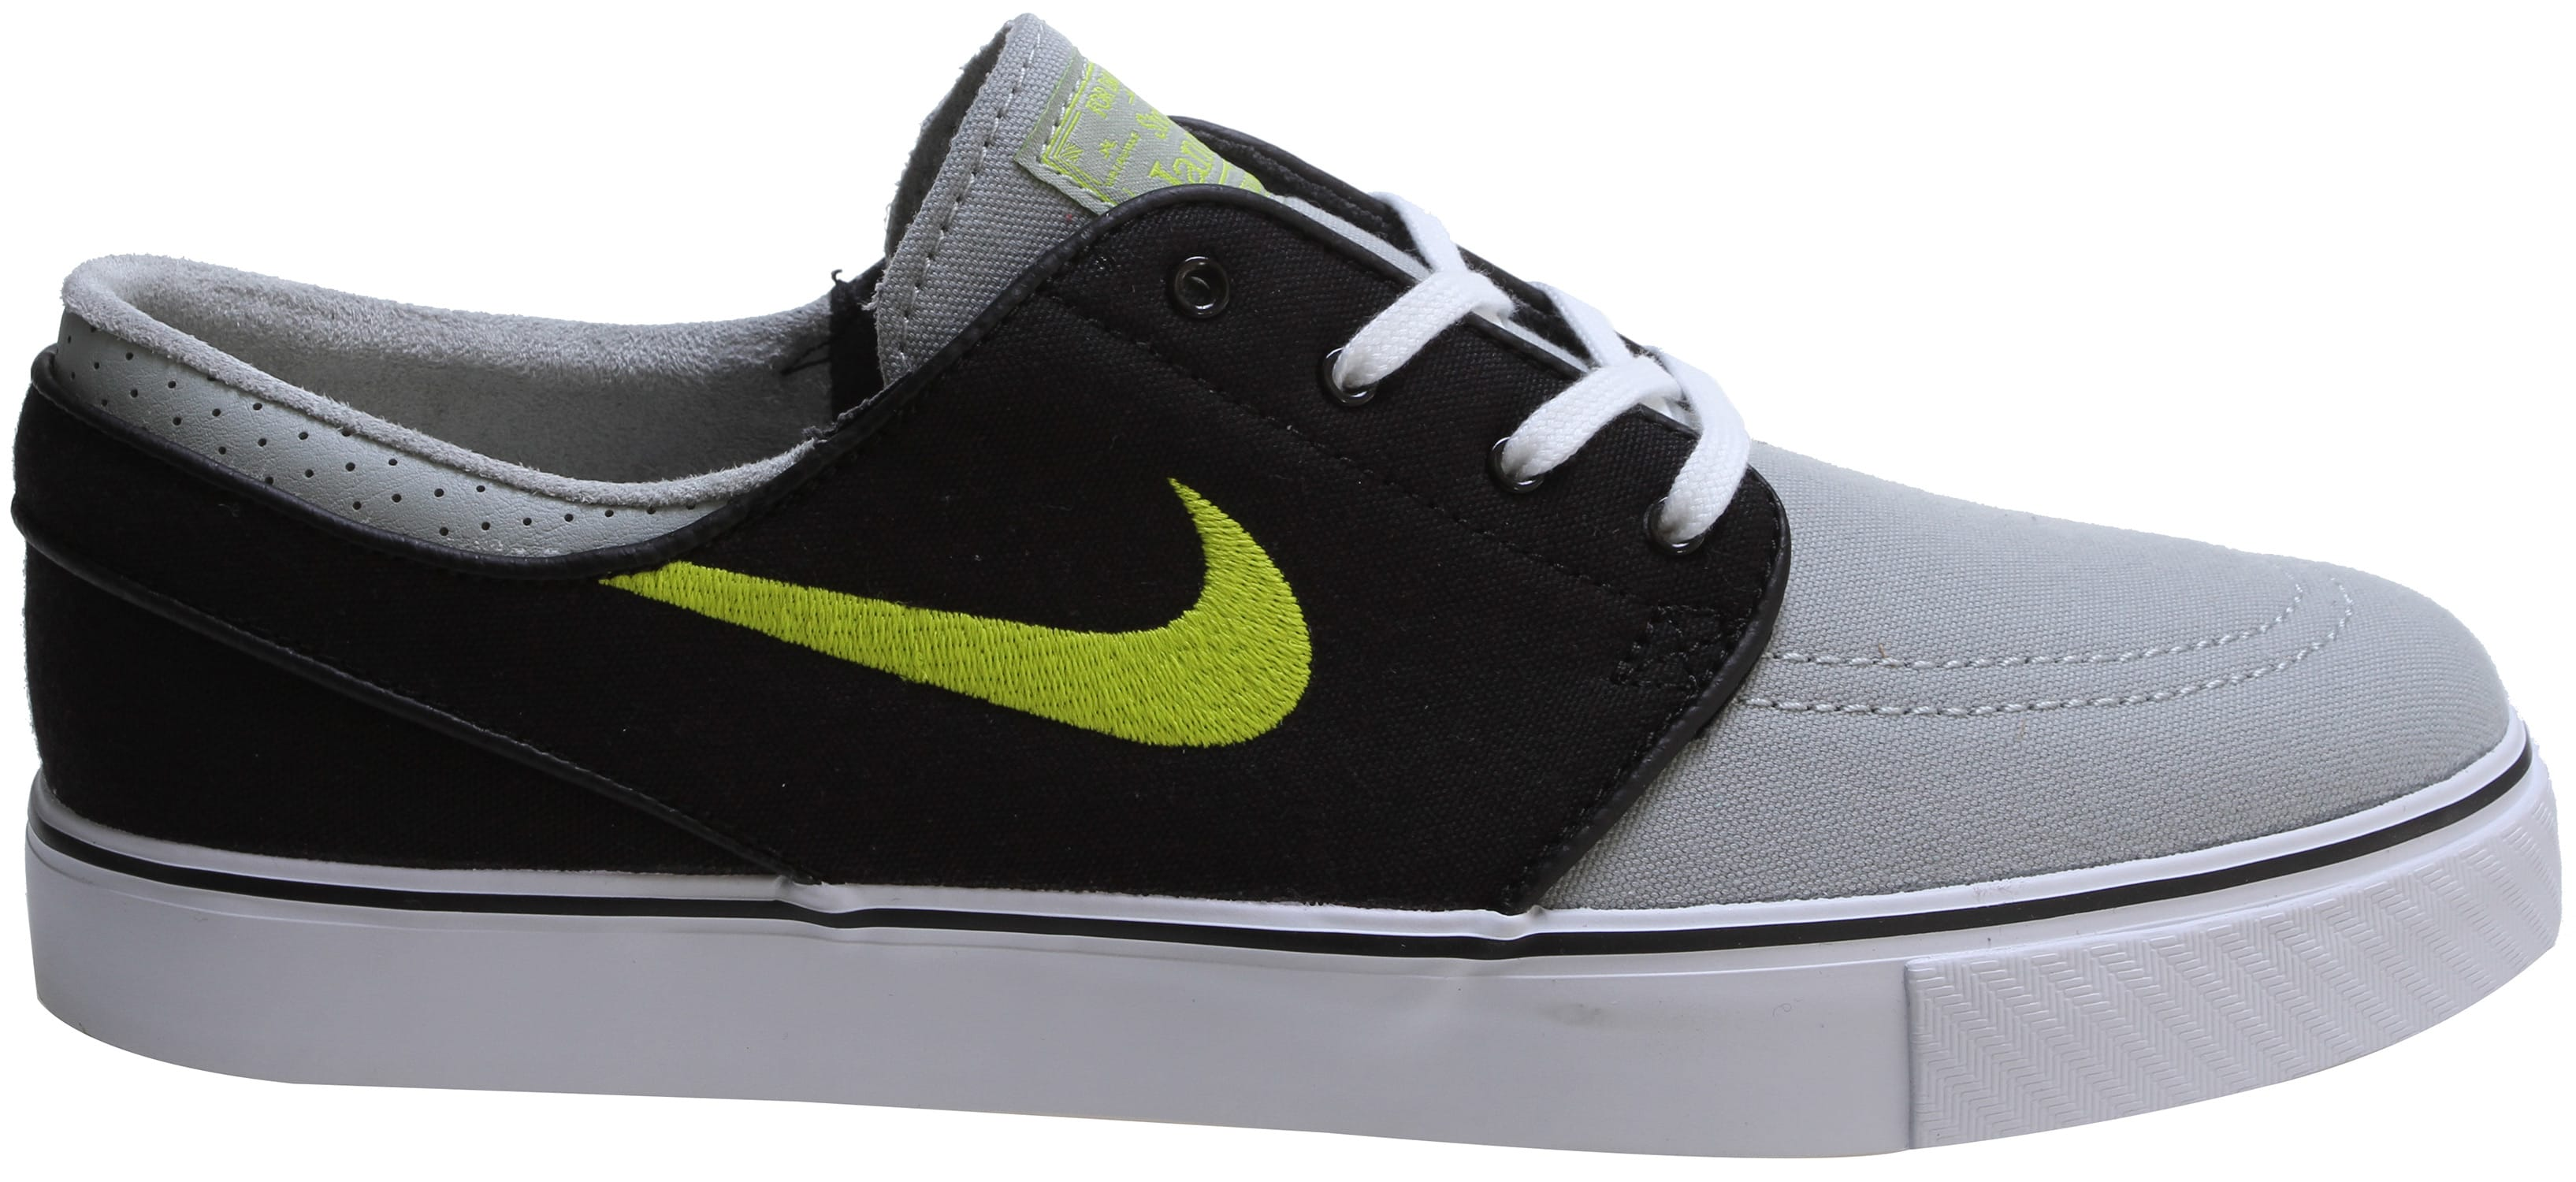 official photos 4cd5c ec02b Nike Zoom Stefan Janoski Canvas Skate Shoes - thumbnail 1